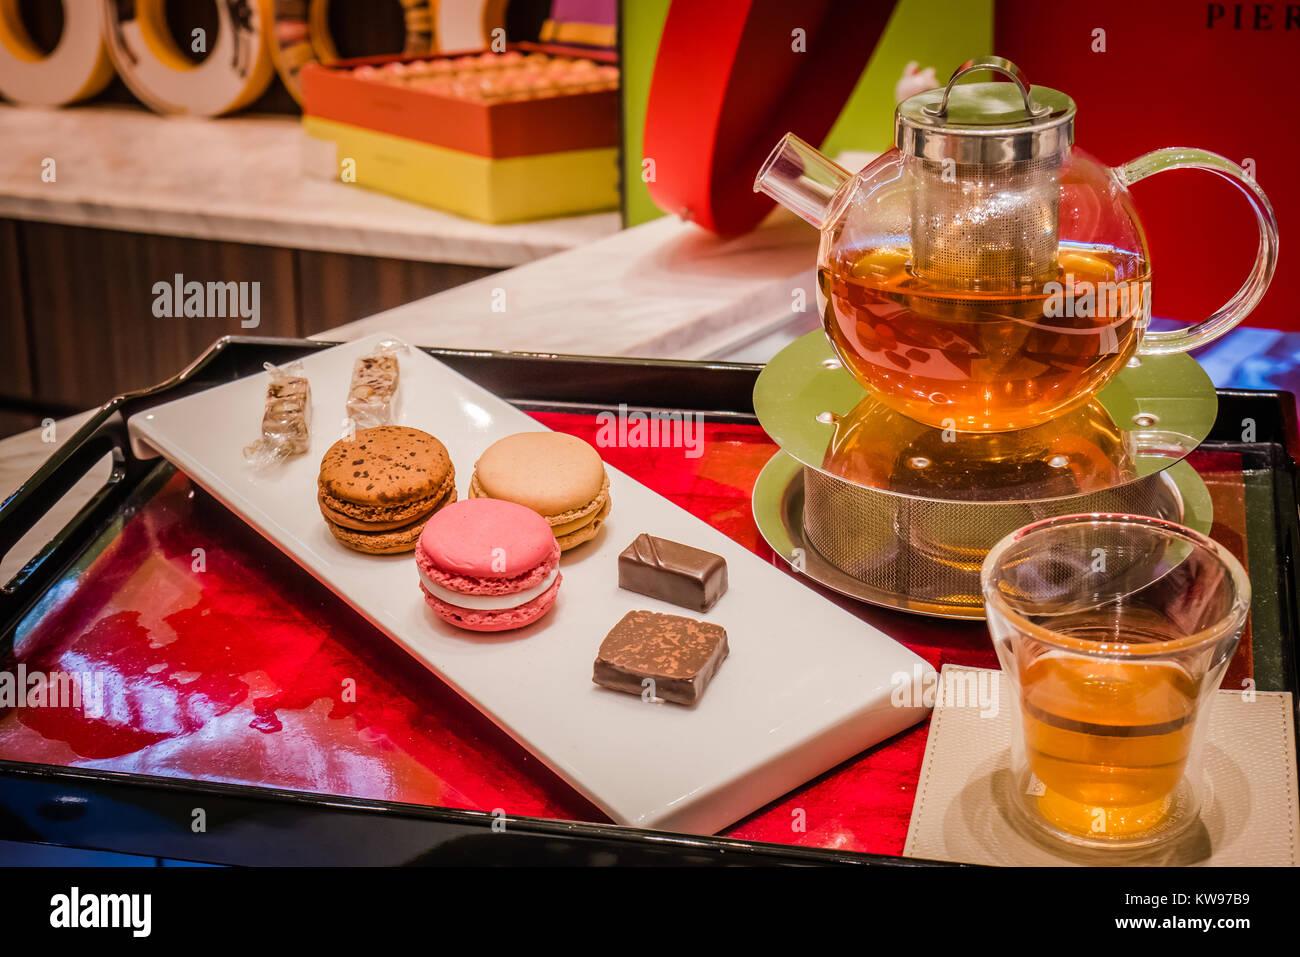 pierre herme macaron and tea display - Stock Image